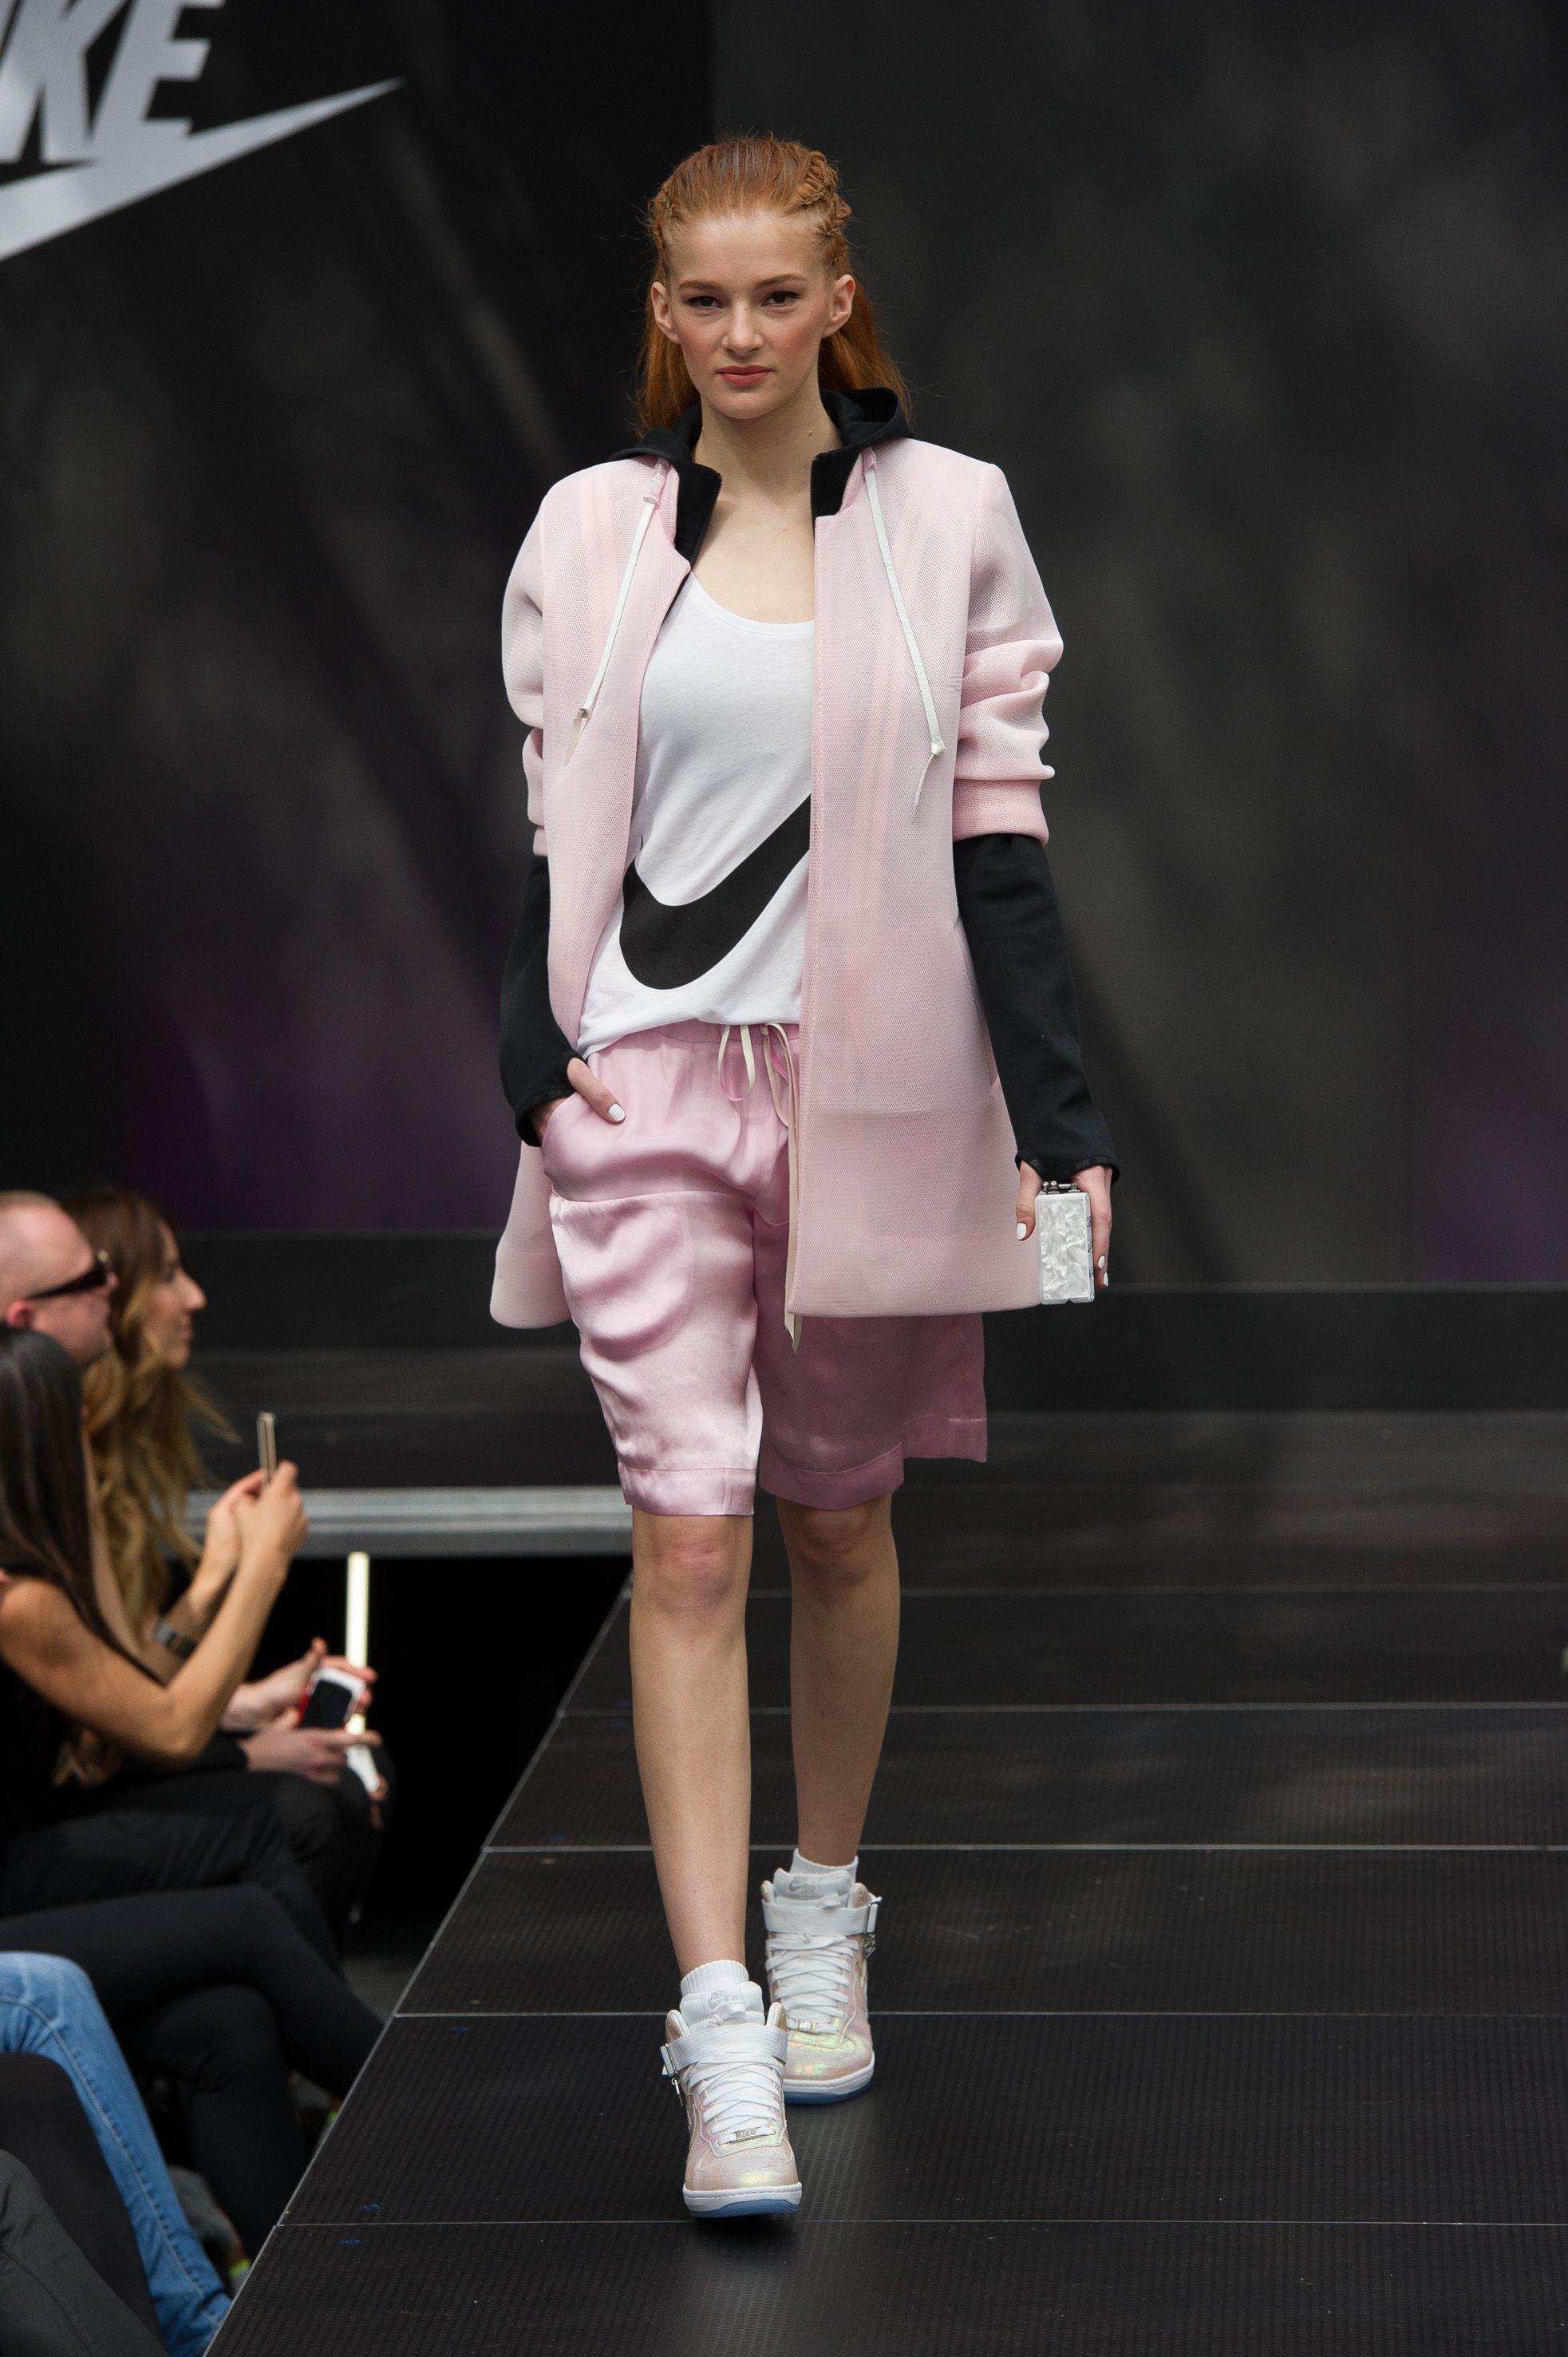 2019 year for women- Fashion Spring trend: chic sportswear